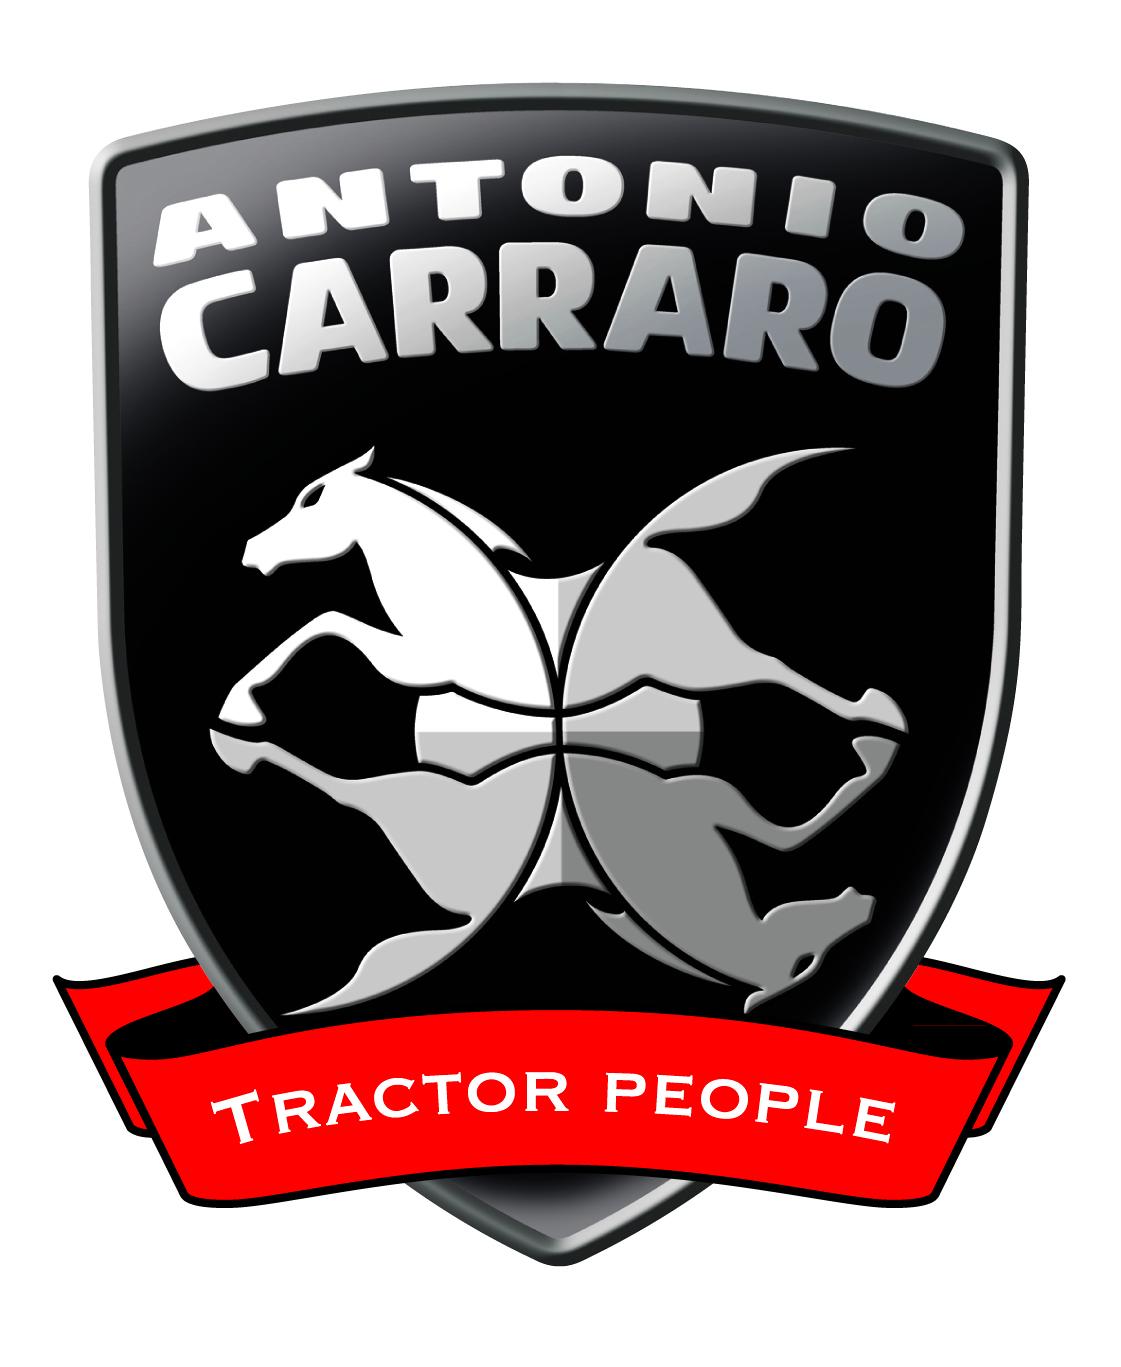 Antonio Carraro sigle